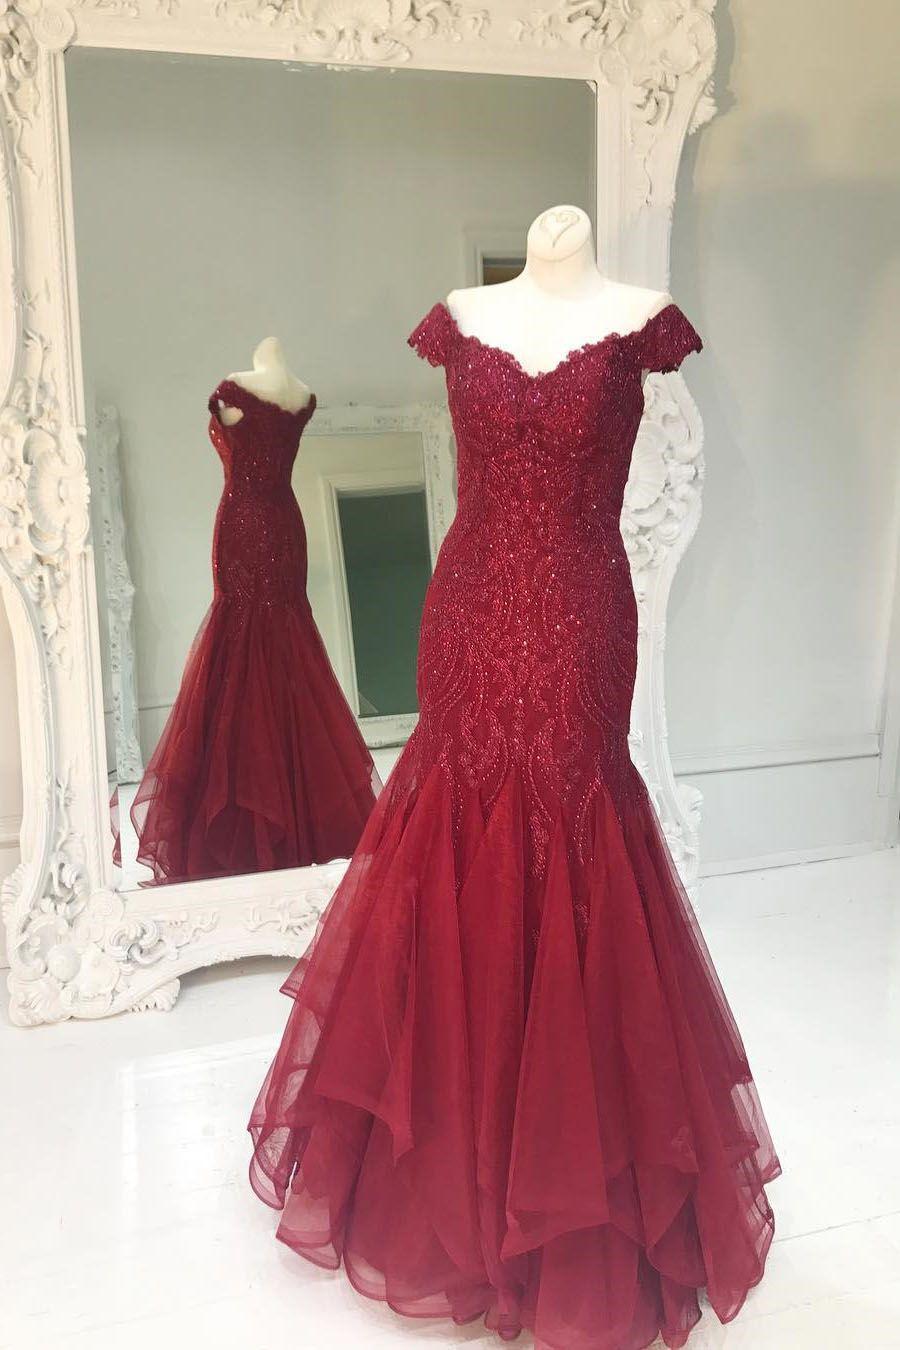 Sparkly beaded vino red mermaid long prom haljina glamour dresses